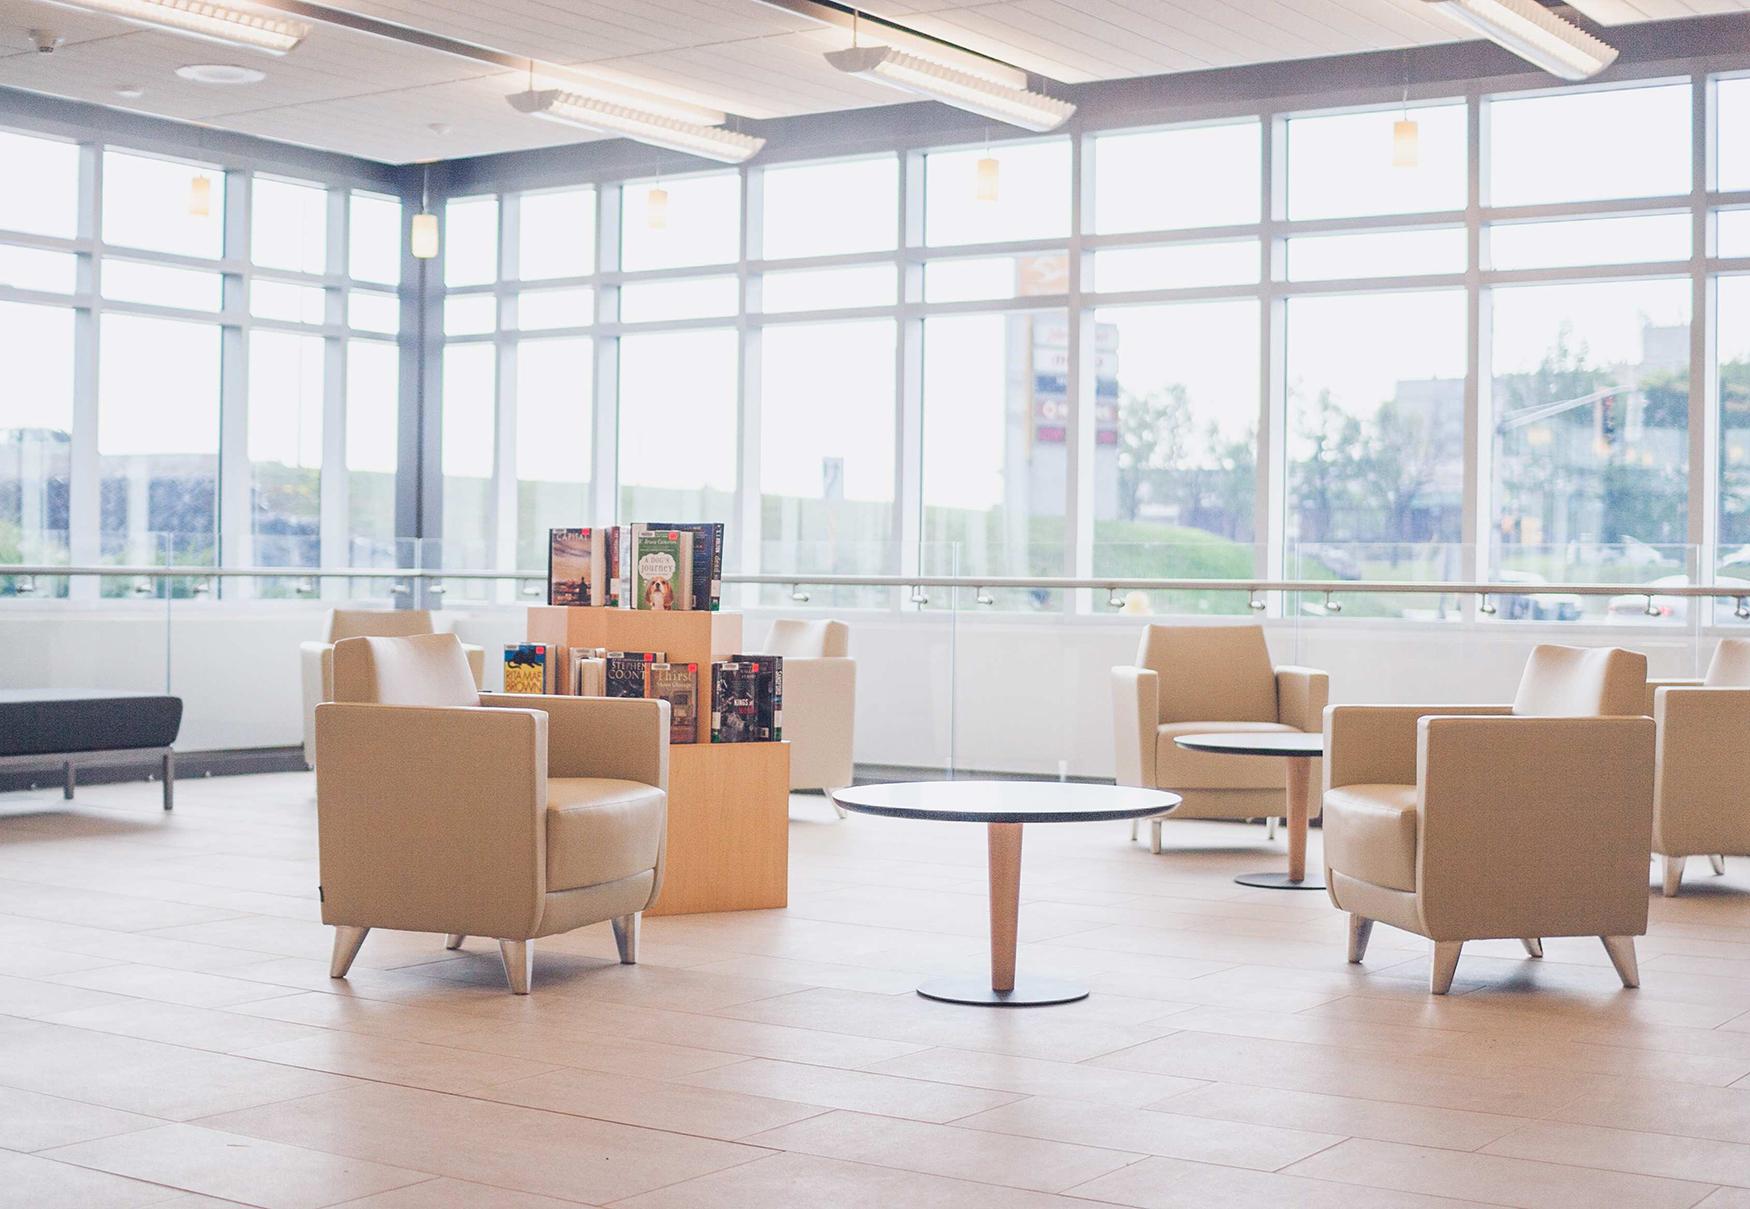 Satori chairs at South End Sudbury Public Library